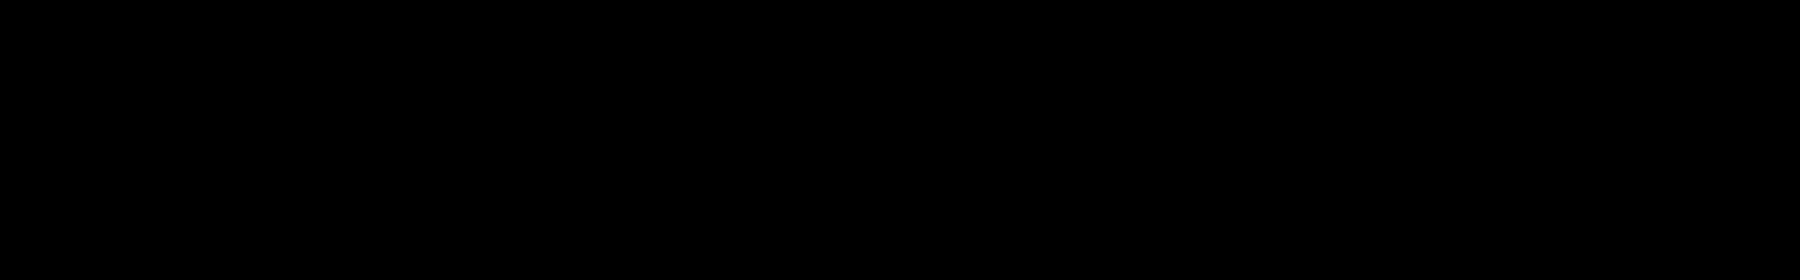 Cosmoworld audio waveform